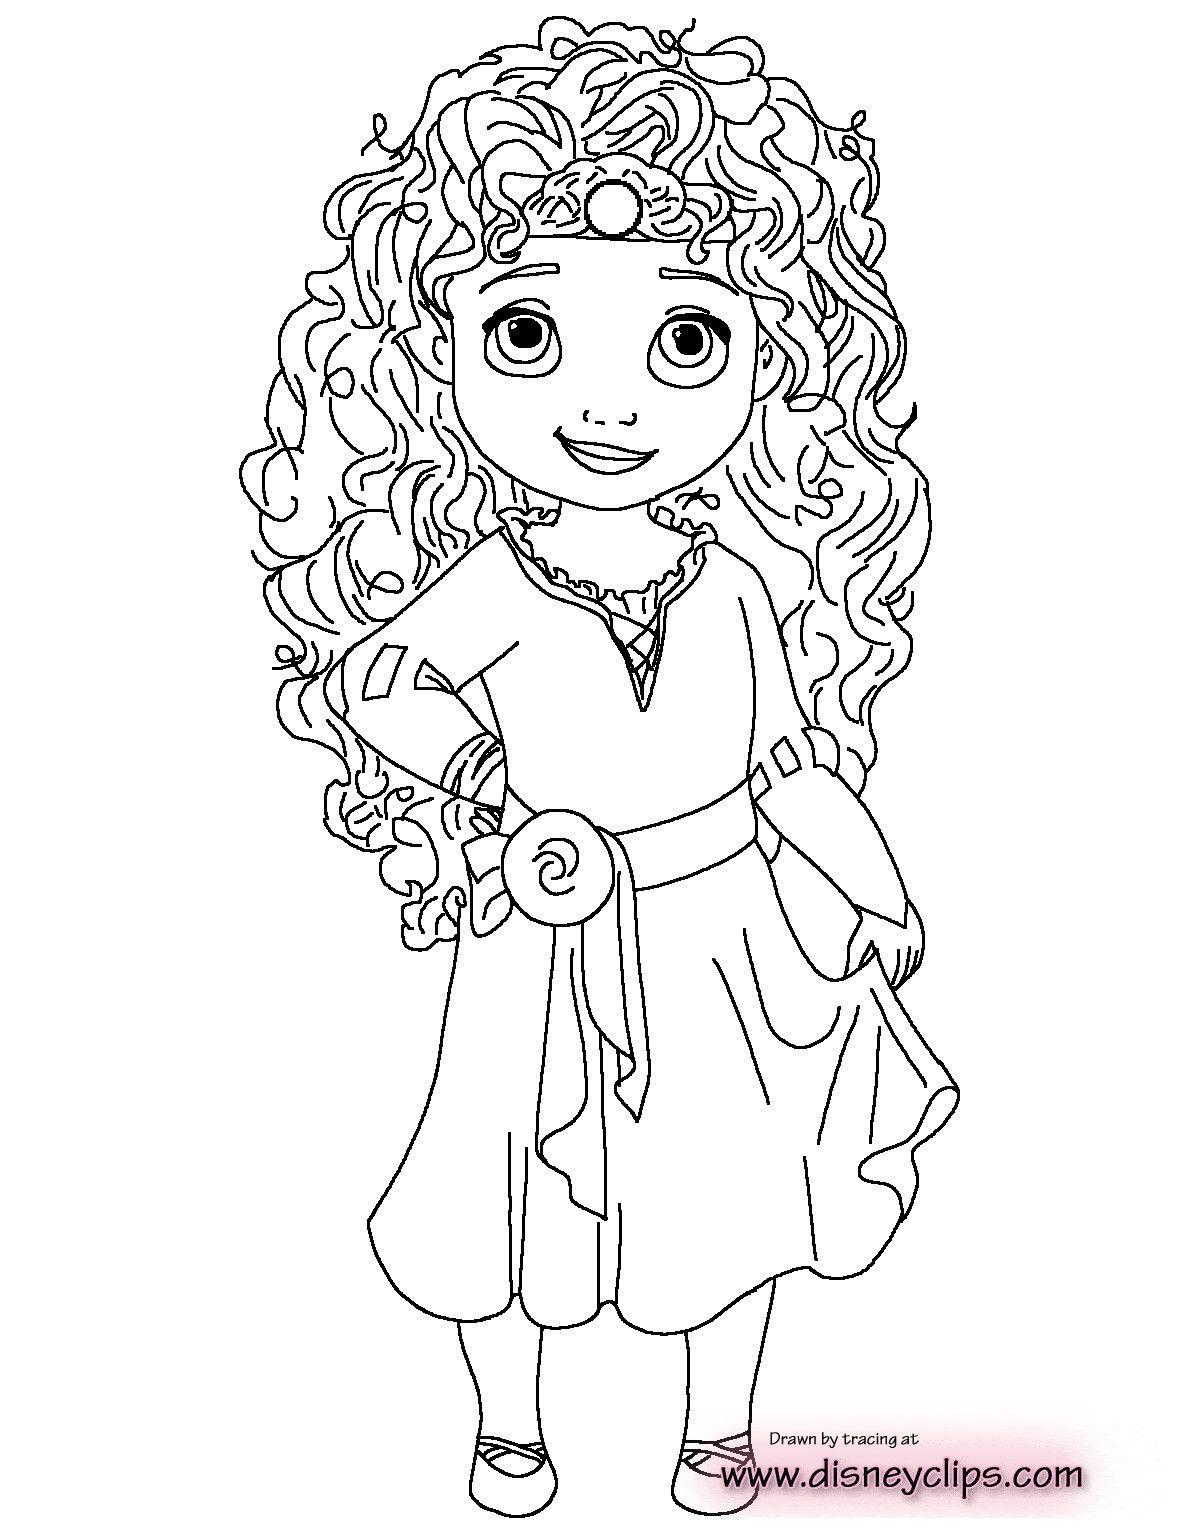 Ariel Princess Coloring Page In 2020 Disney Coloring Pages Disney Princess Coloring Pages Disney Princess Colors